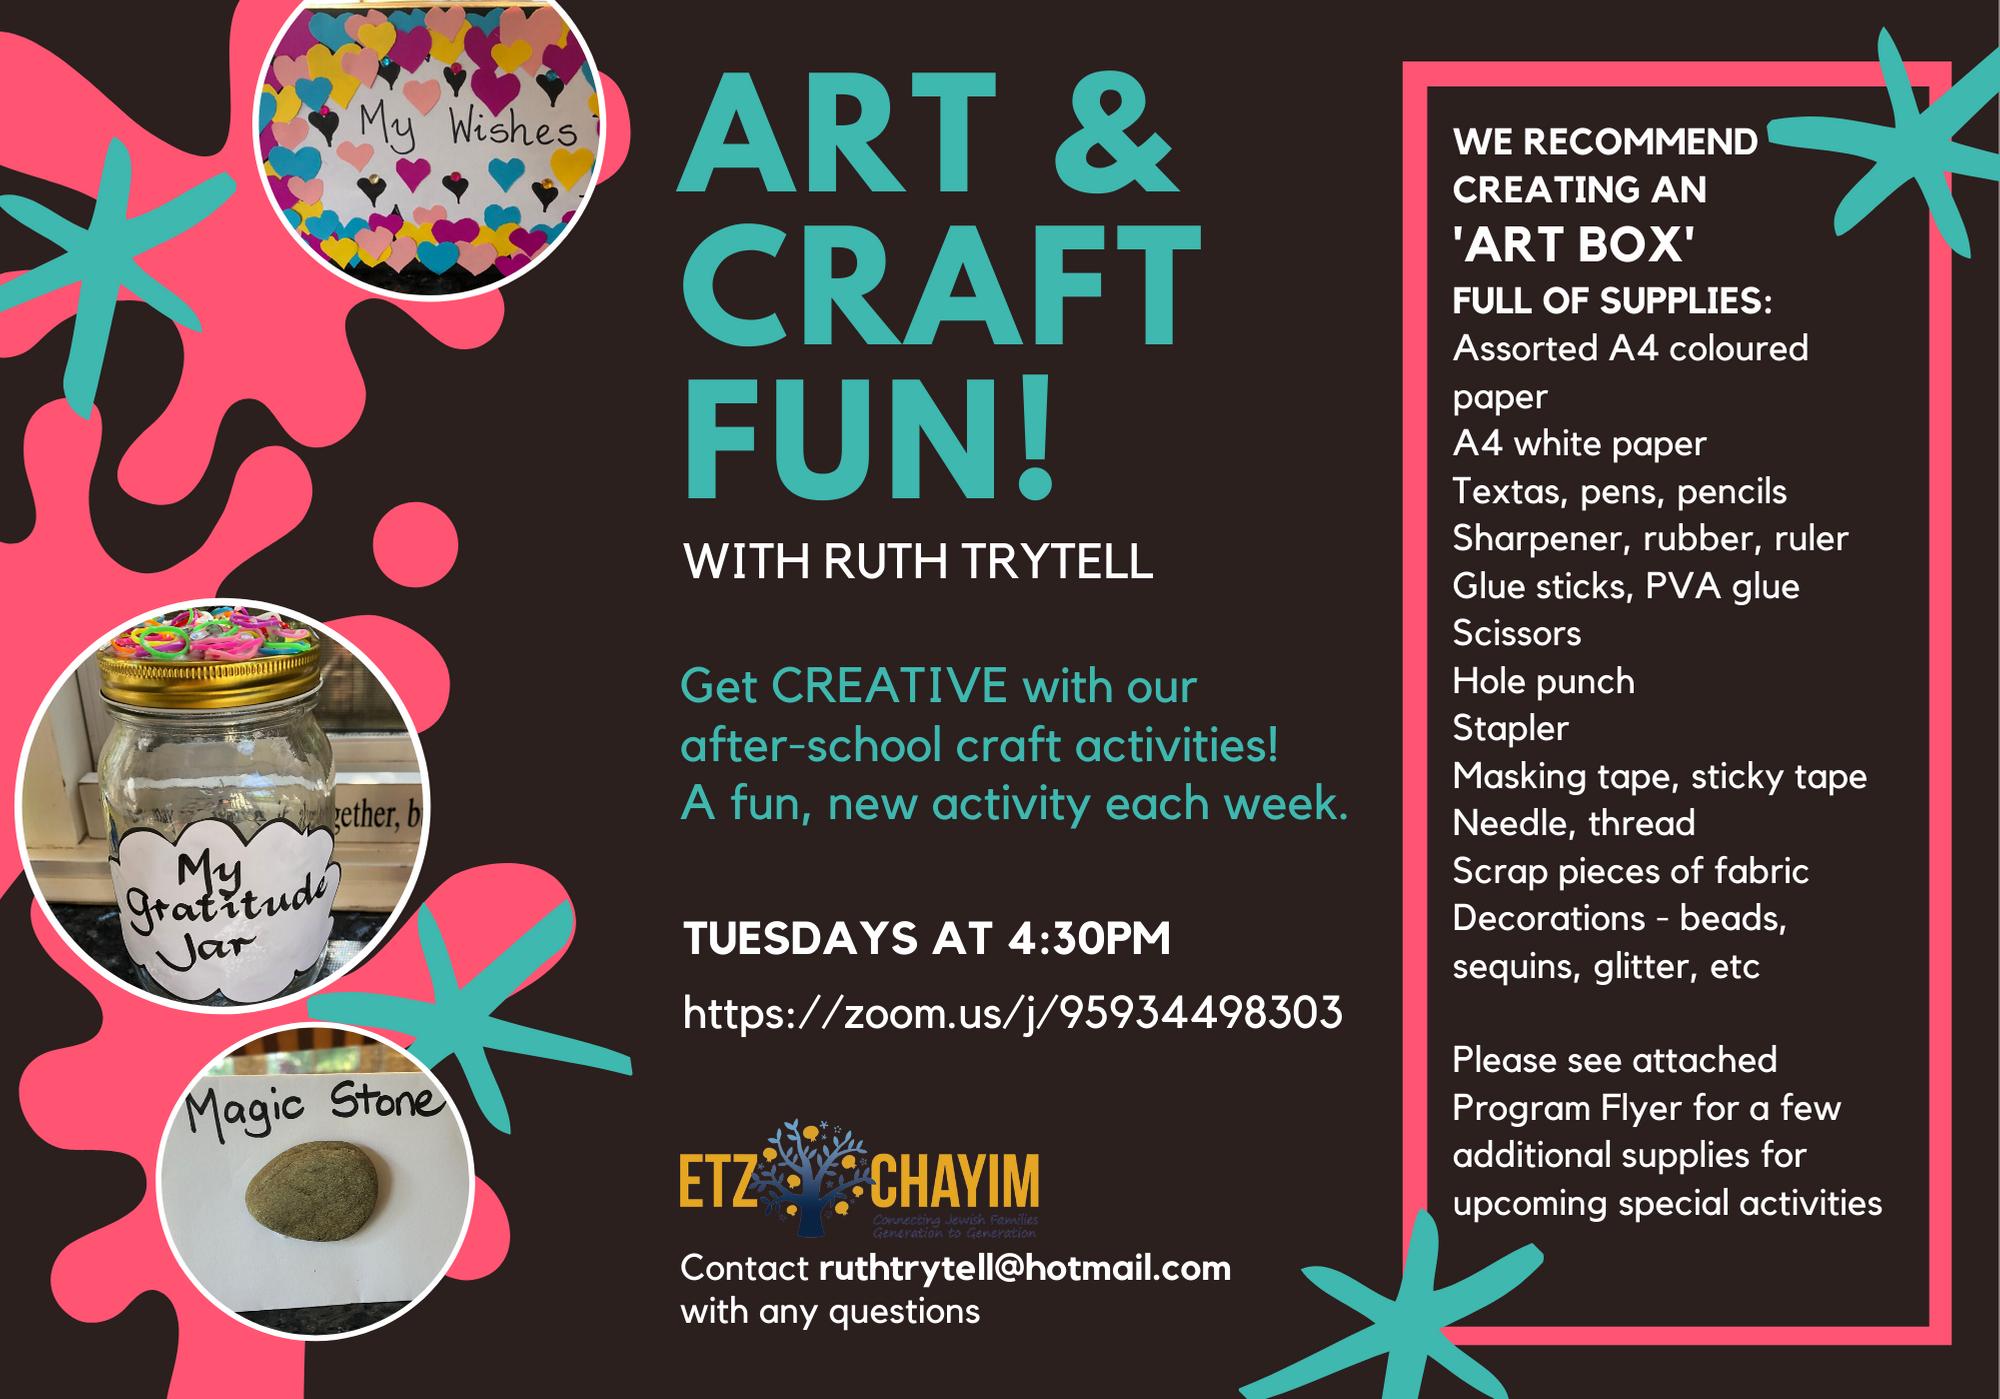 Art & Craft Fun with Ruth Trytell 3